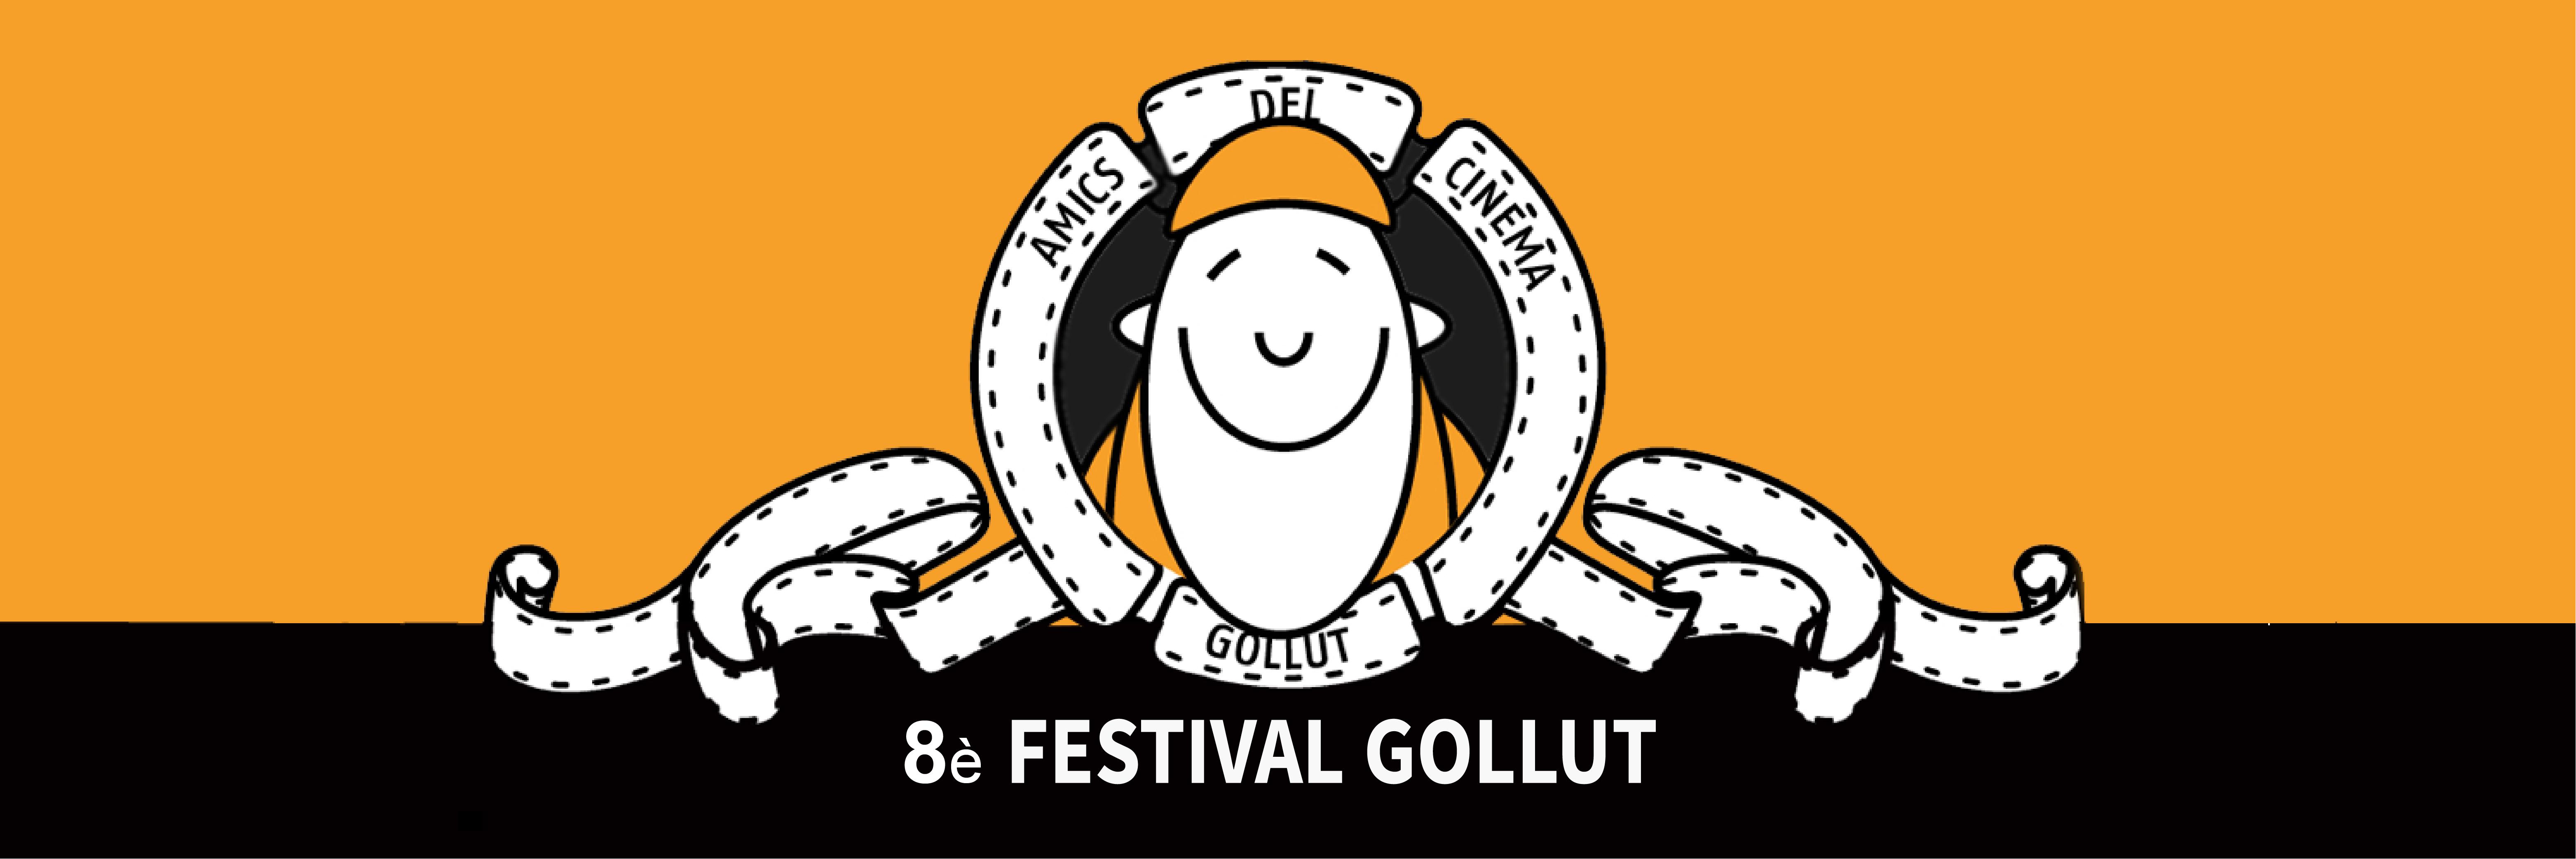 Logo Festival Gollut 2021